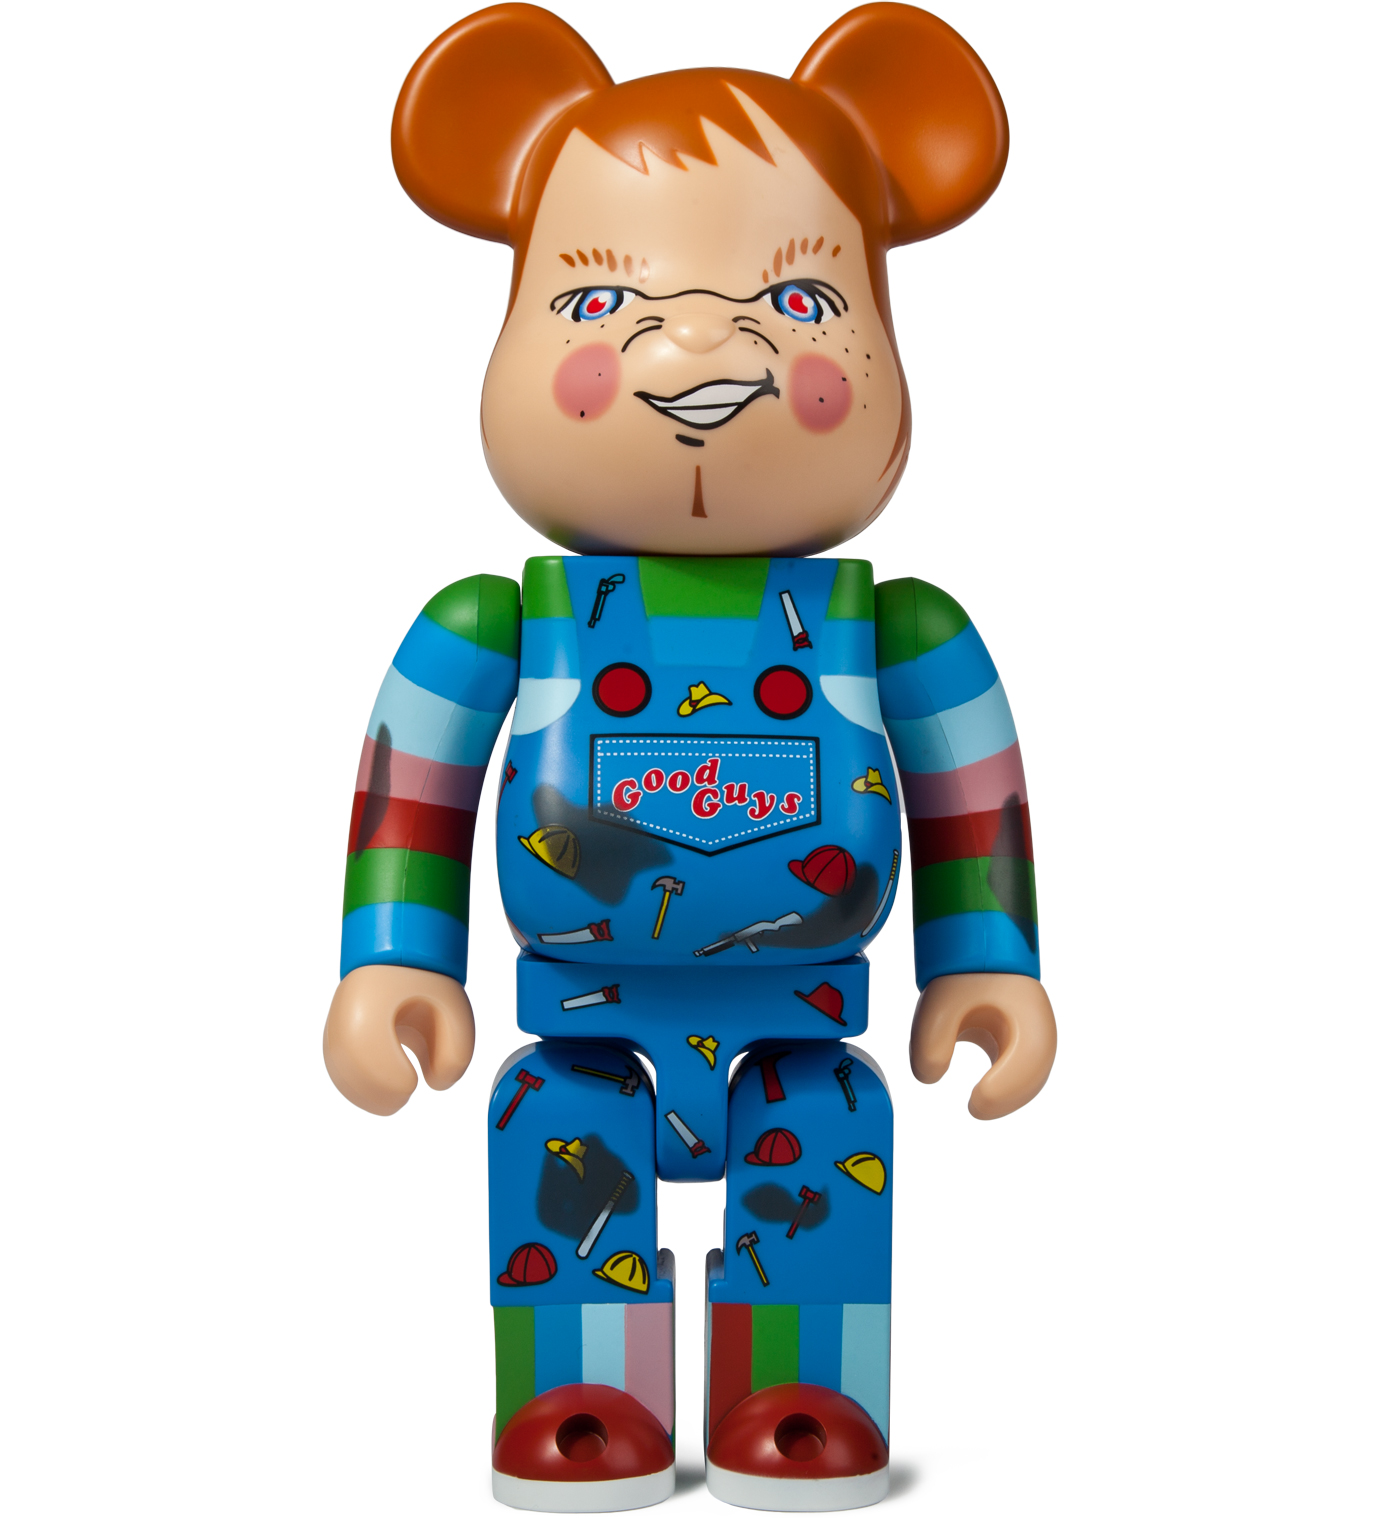 Toys R Us Chucky : Medicom toy chucky be rbrick hbx